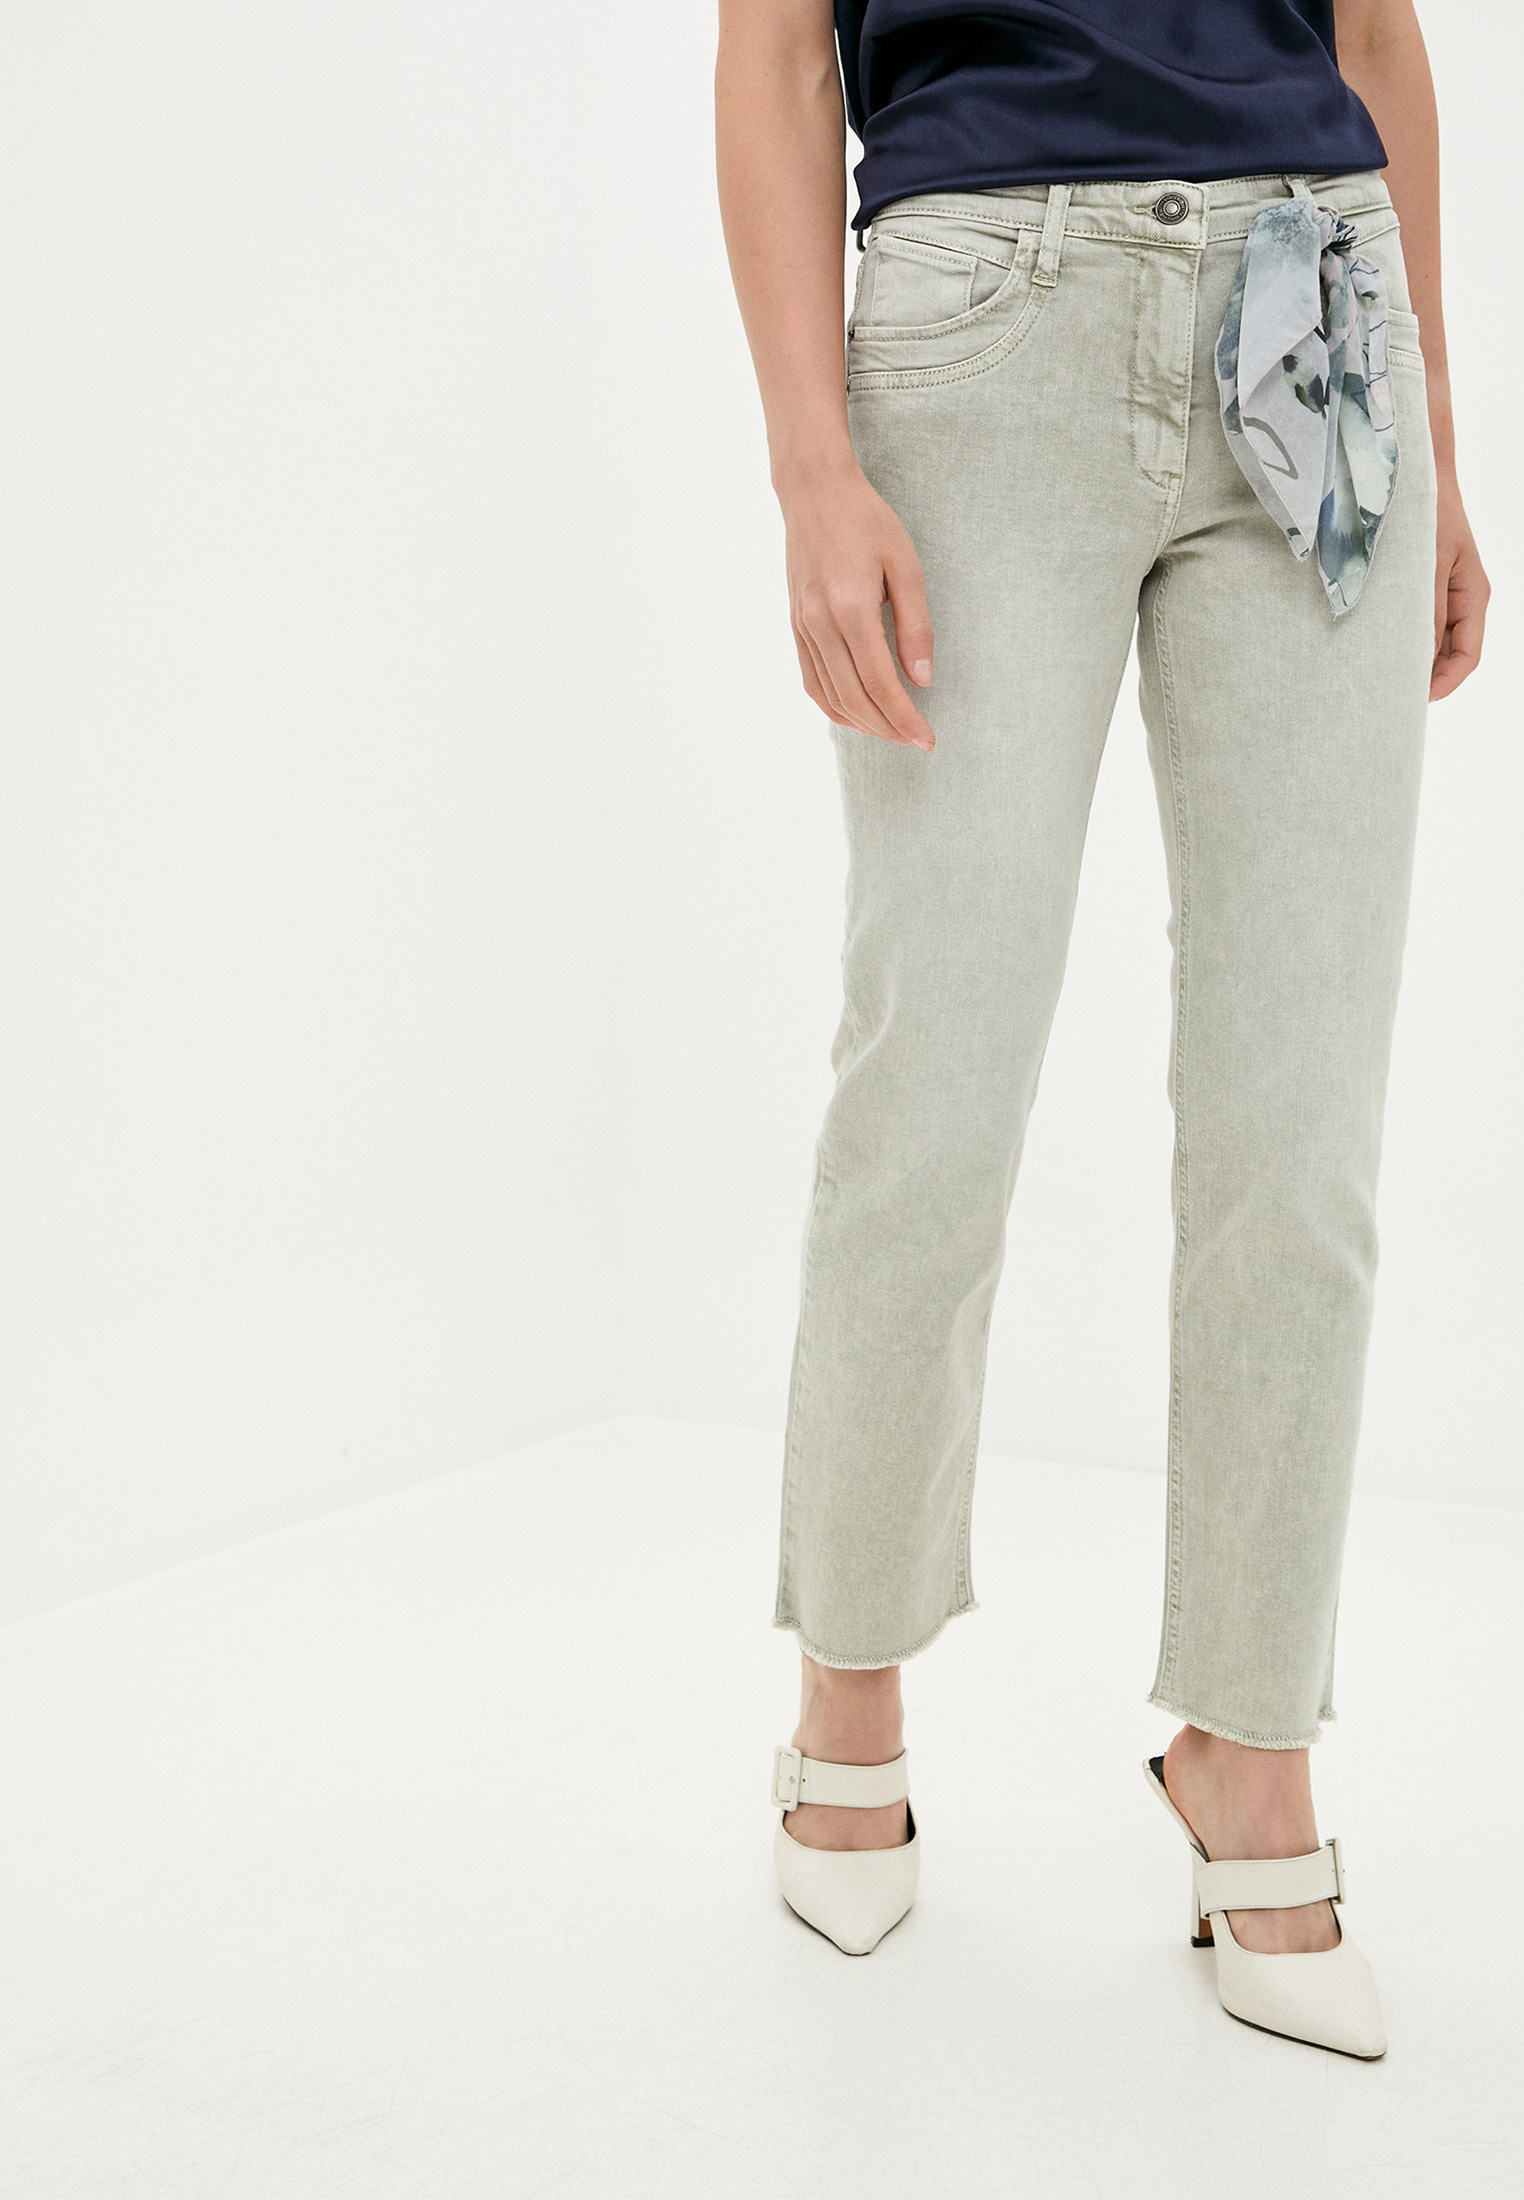 Женские джинсы Betty Barclay 6145/1703